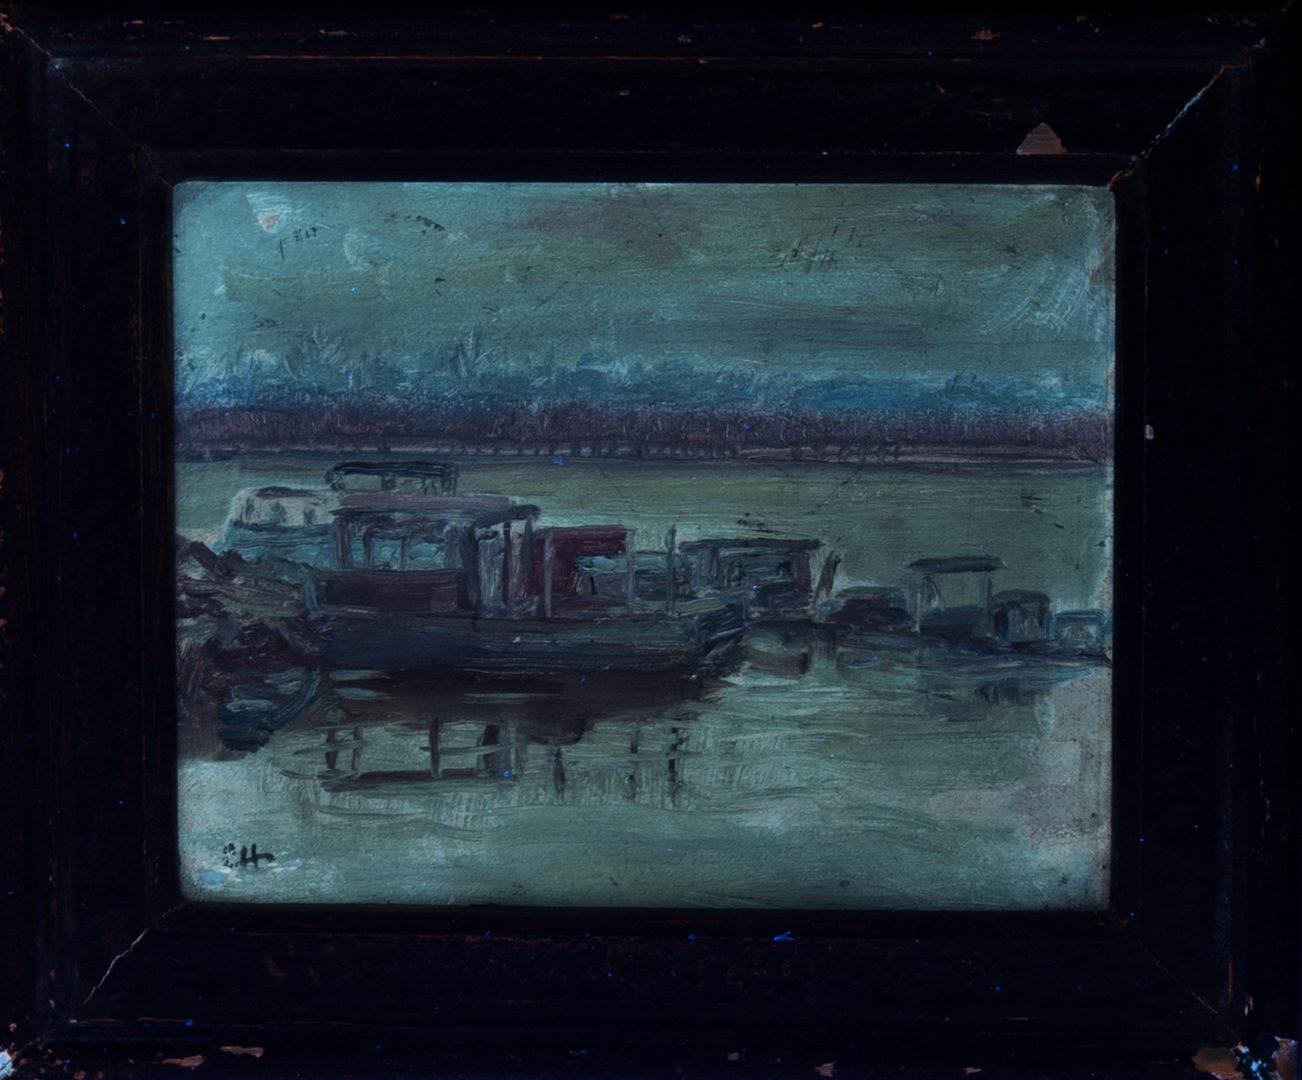 Lot 186: Cornelius Hankins Memphis Barge Painting